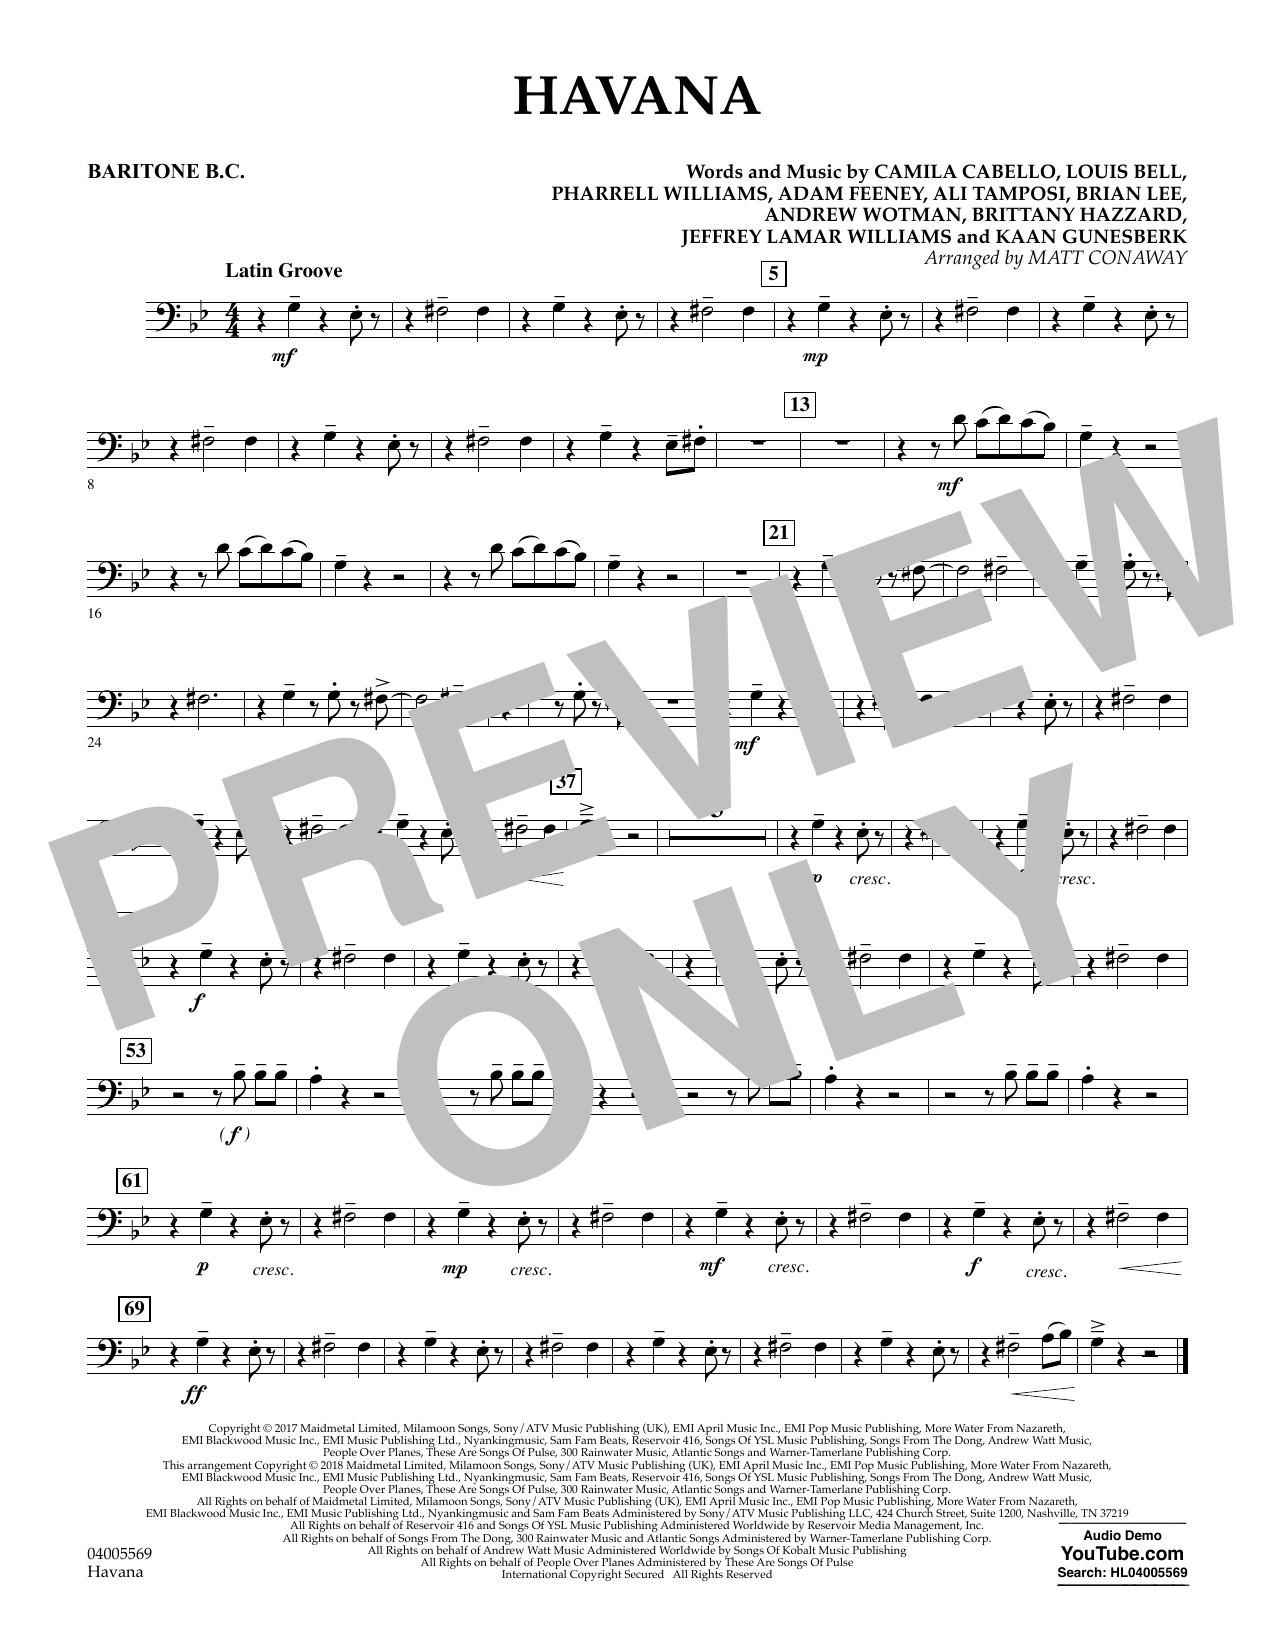 Matt Conaway Havana - Baritone B.C. sheet music notes and chords. Download Printable PDF.